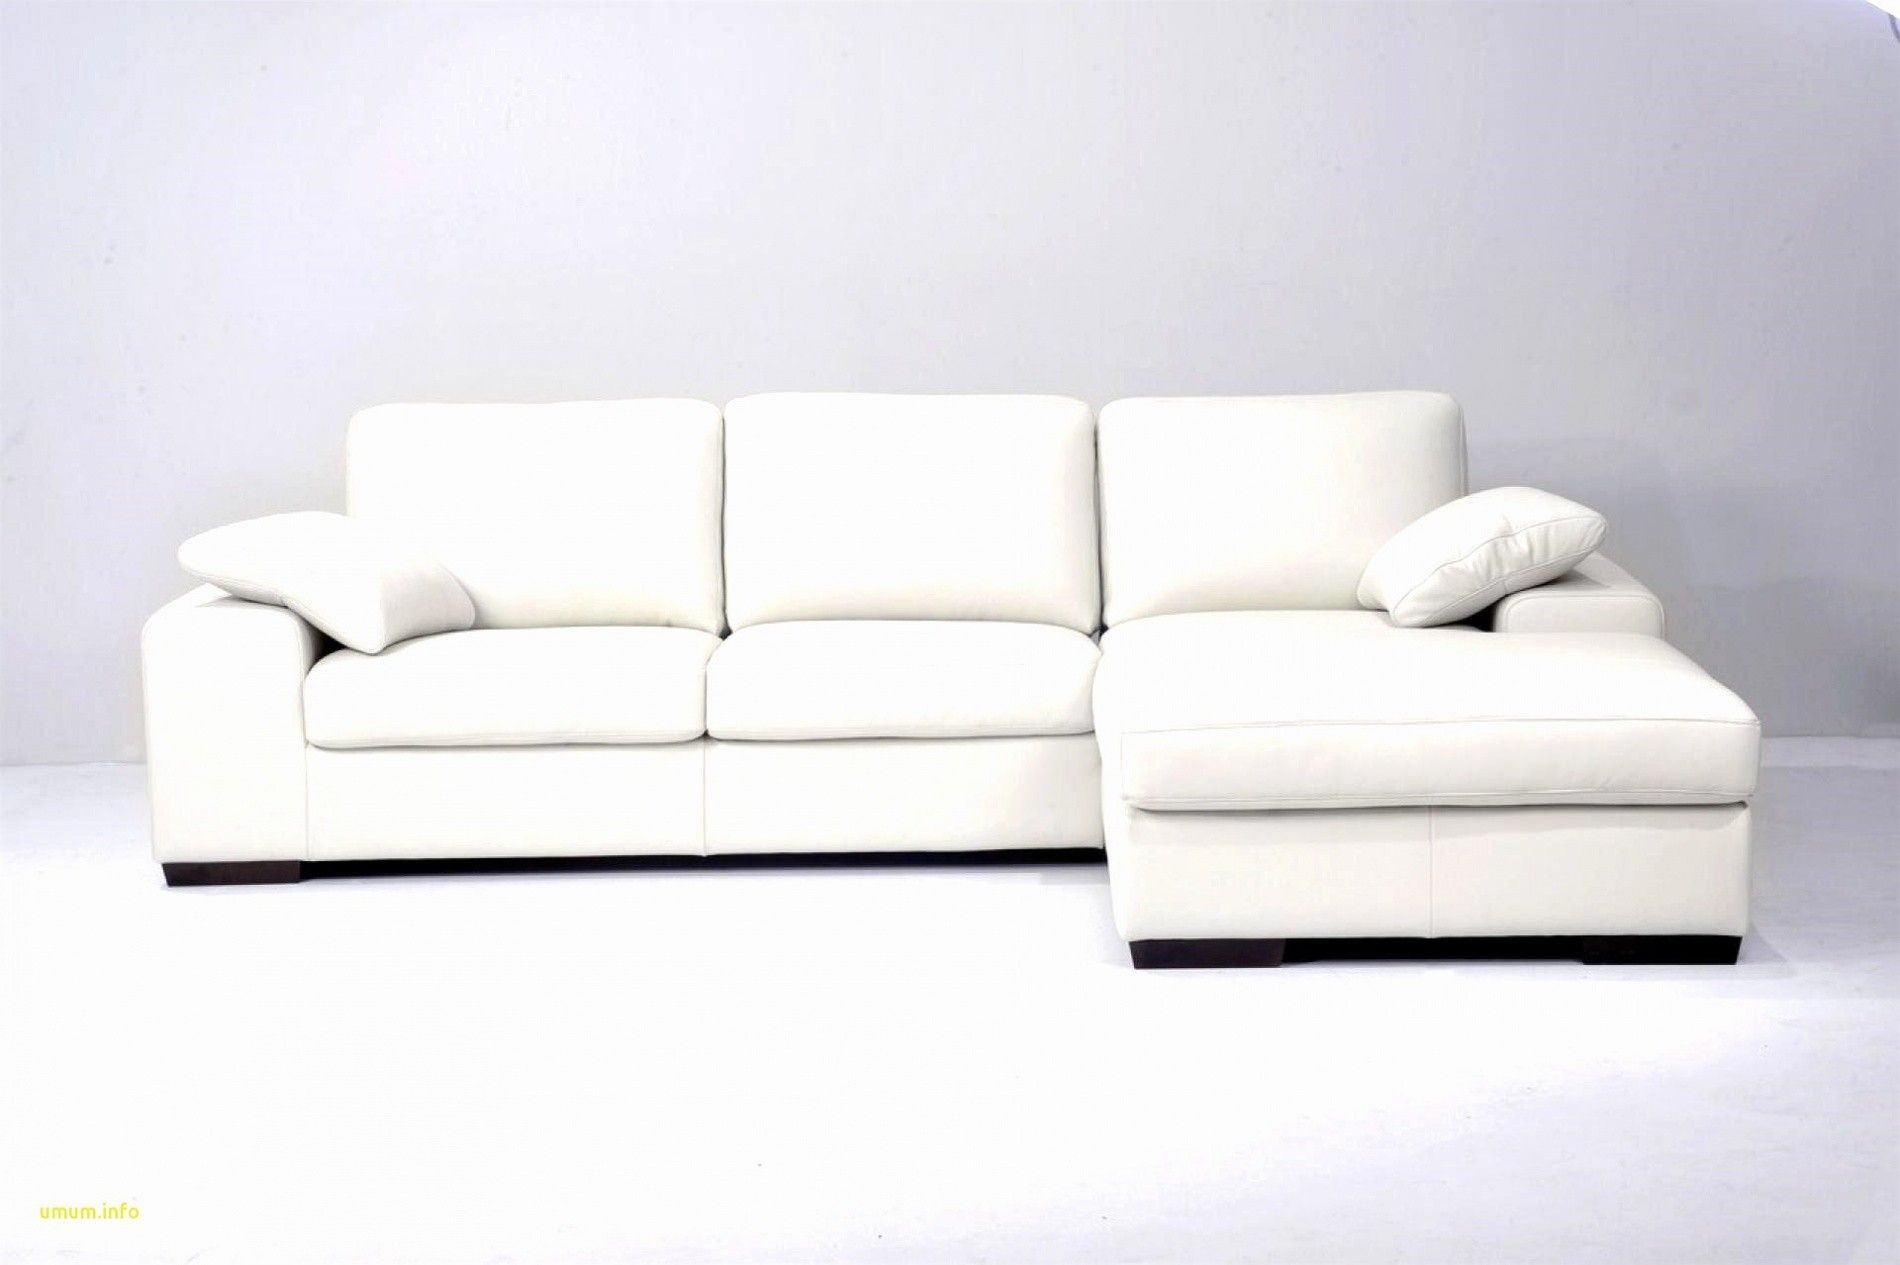 Salon De Jardin Canape D Angle Ou Belle Canape Bois Canape Ikea Transforming Furniture Reupholster Furniture